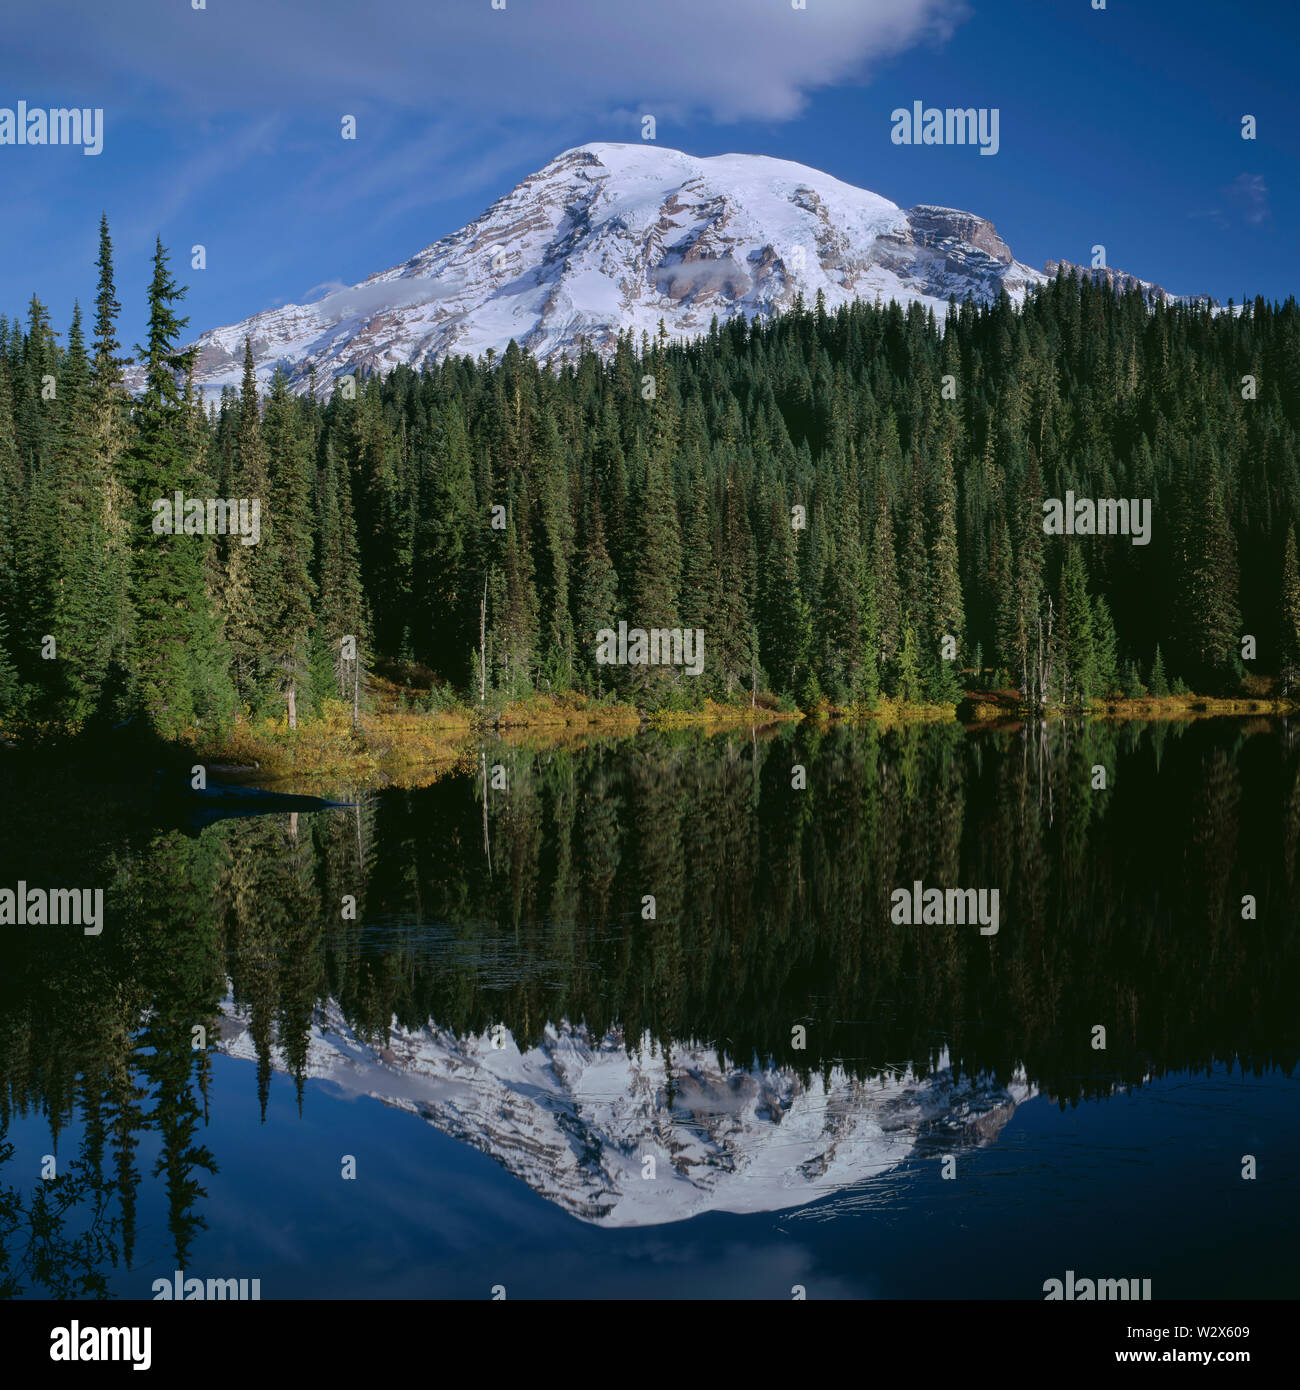 USA, Washington, Mt. Rainier National Park, Mount Rainier and fall colored shrubs are mirrored in Reflection Lake. - Stock Image